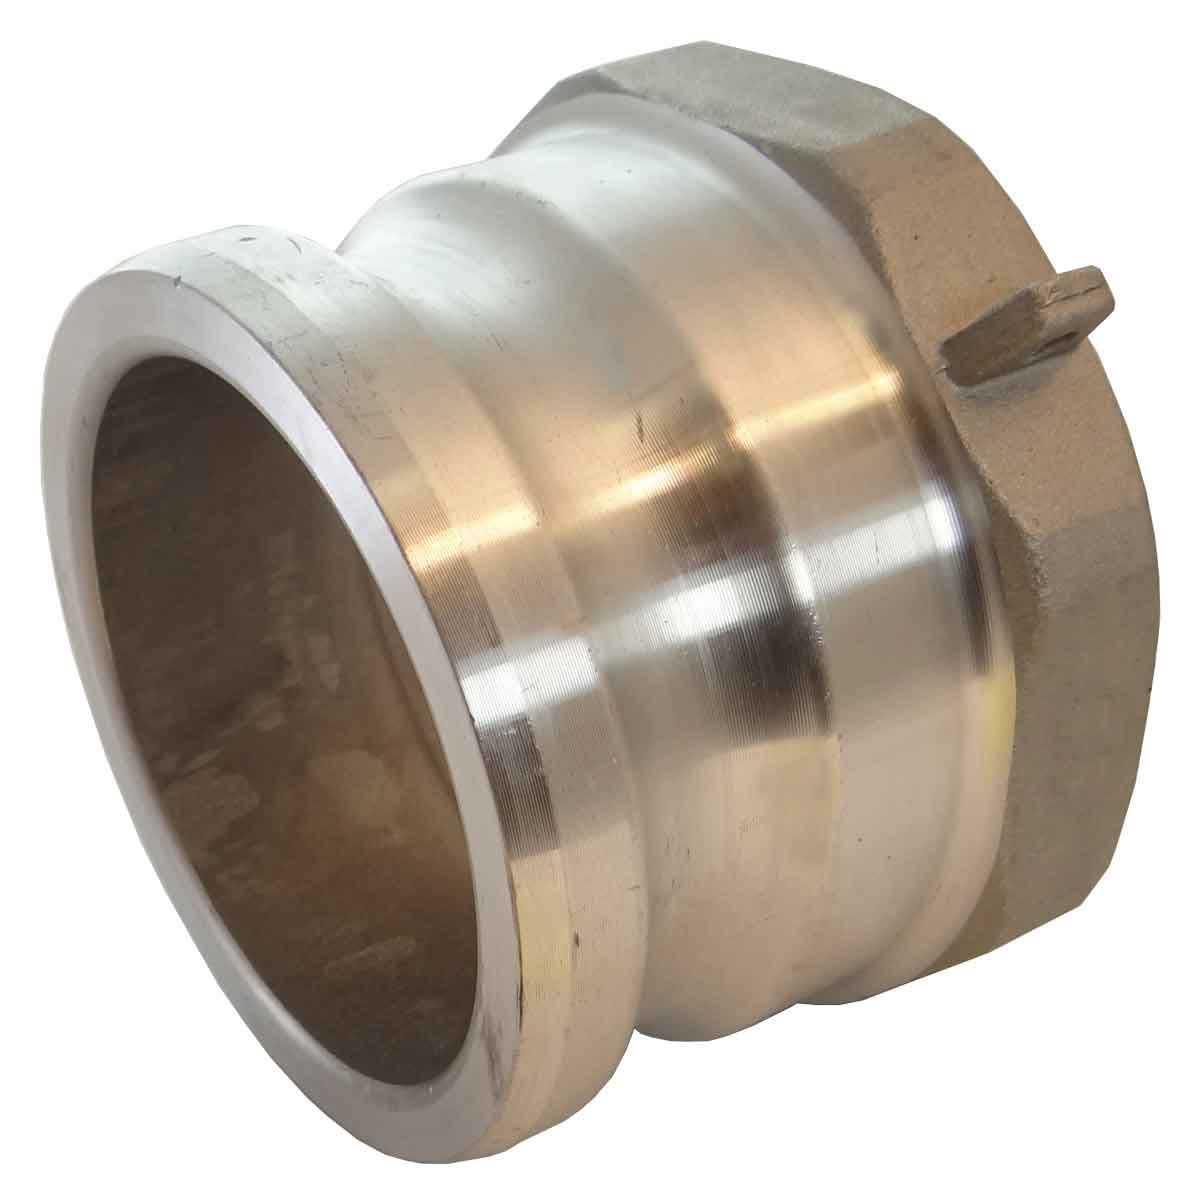 Wacker Neuson Coupling 6 inch Plug 5000078033